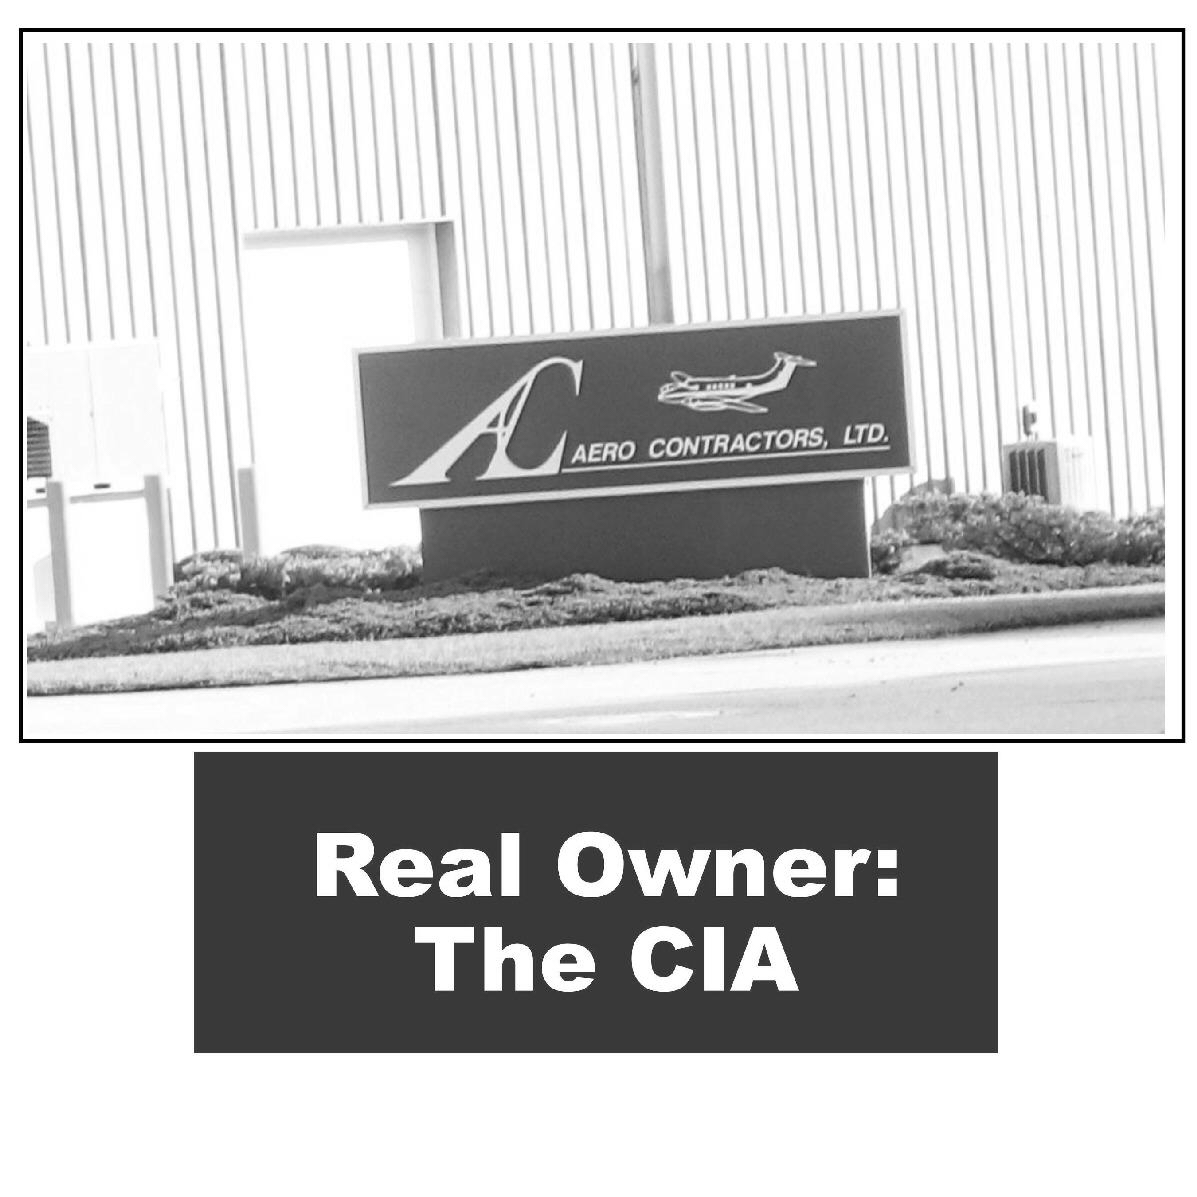 Aero Contractors, Smithfield NC, company sign